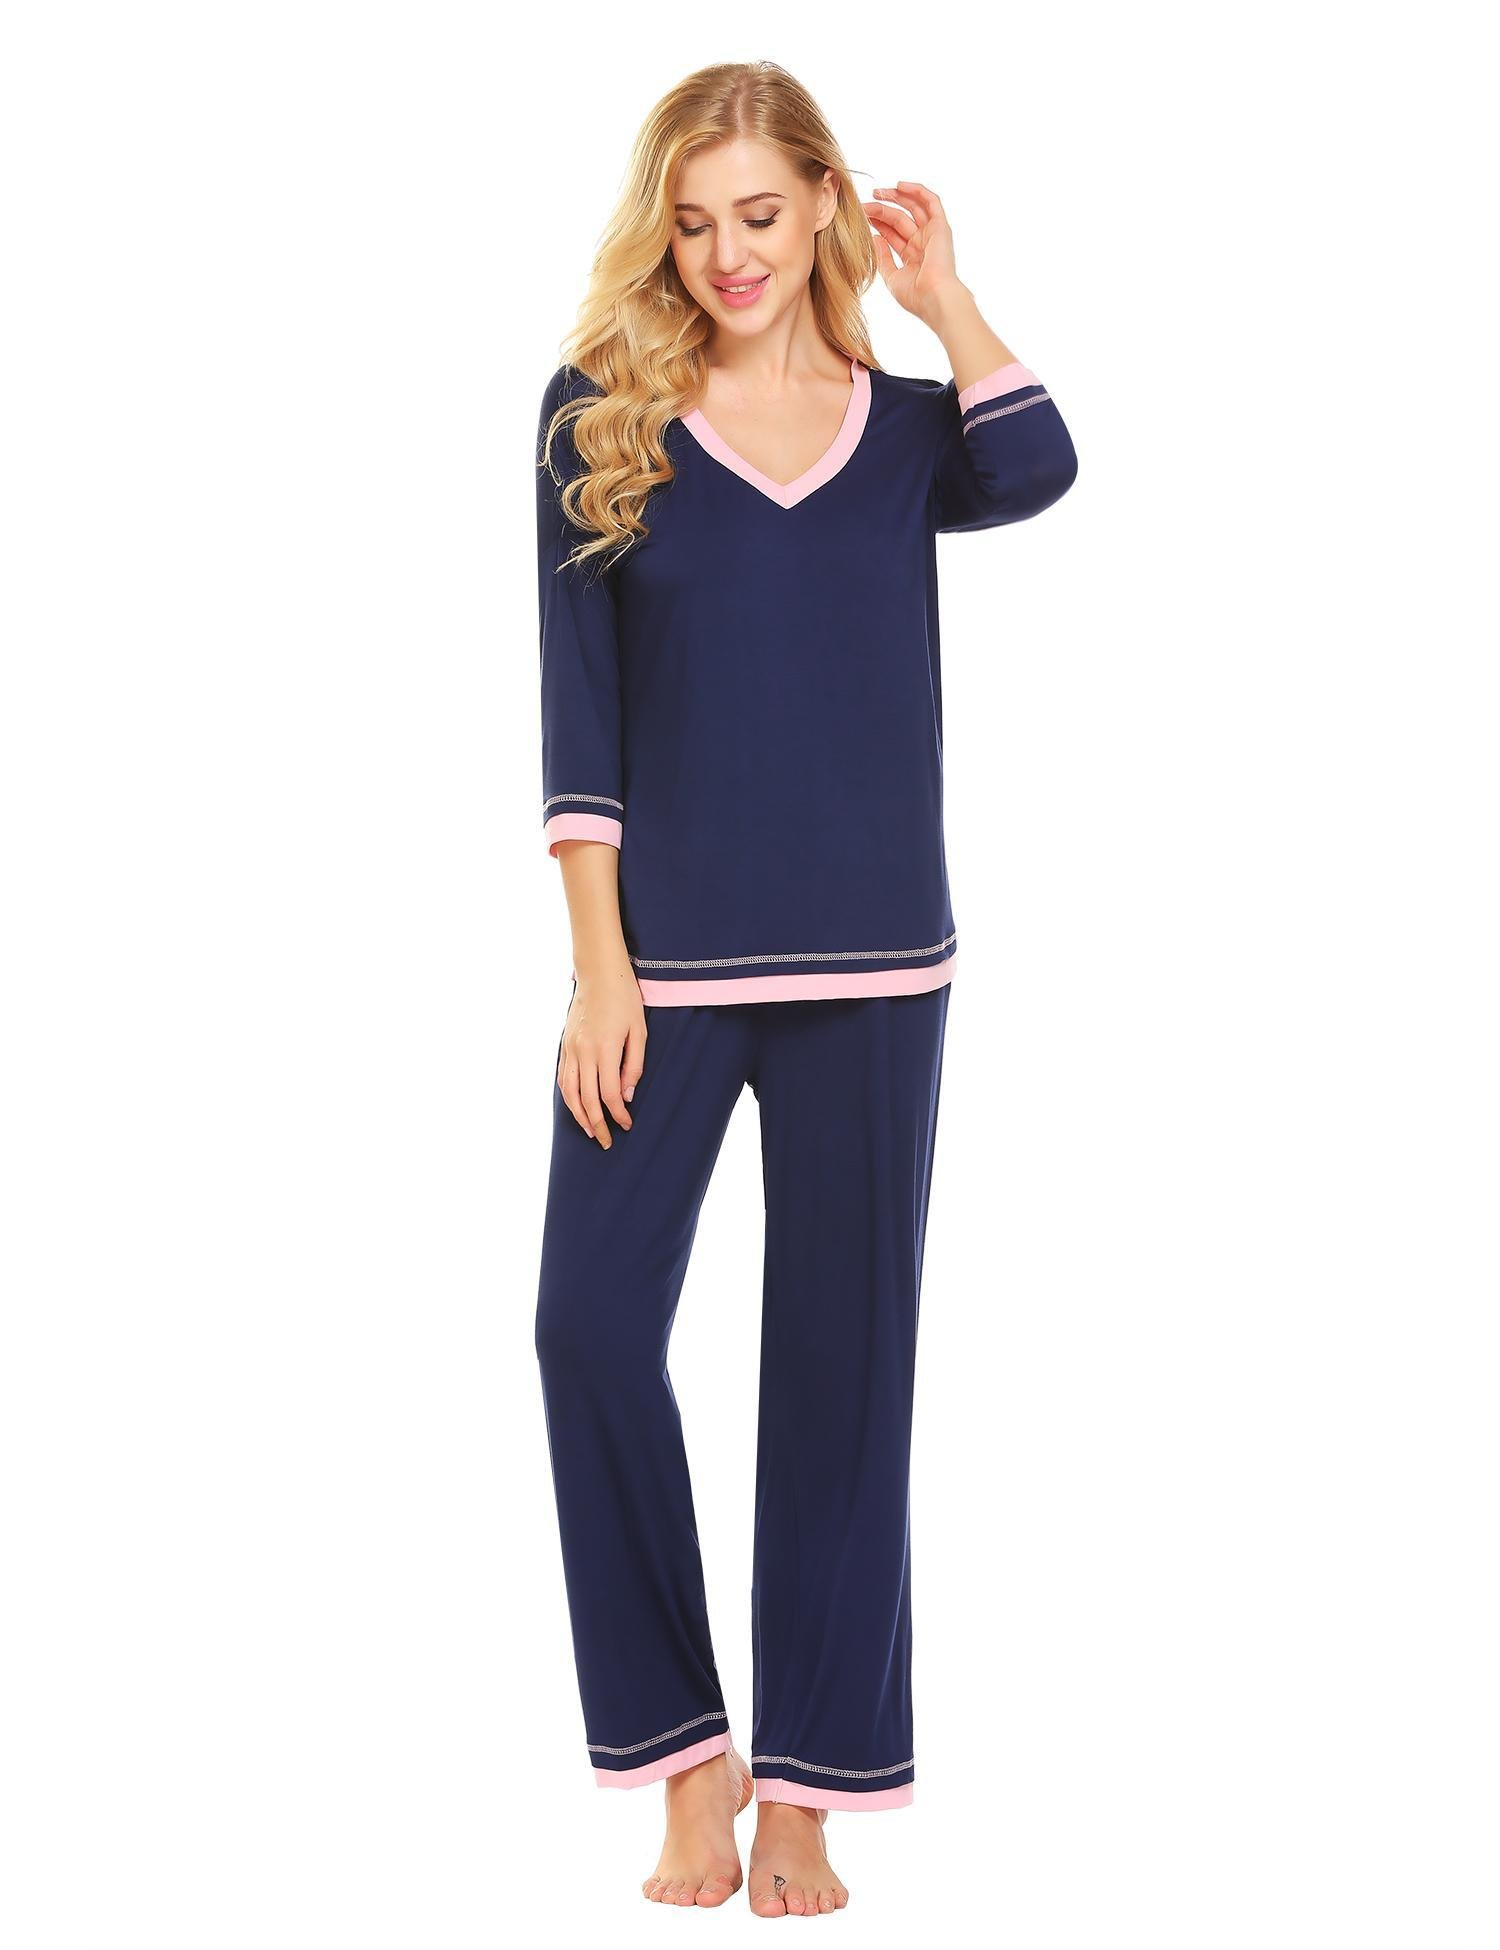 Ekouaer Pajamas Women's Long-Sleeve Pjs Top with Long Lounge Pants Soft Sleepwear Set S-XXL